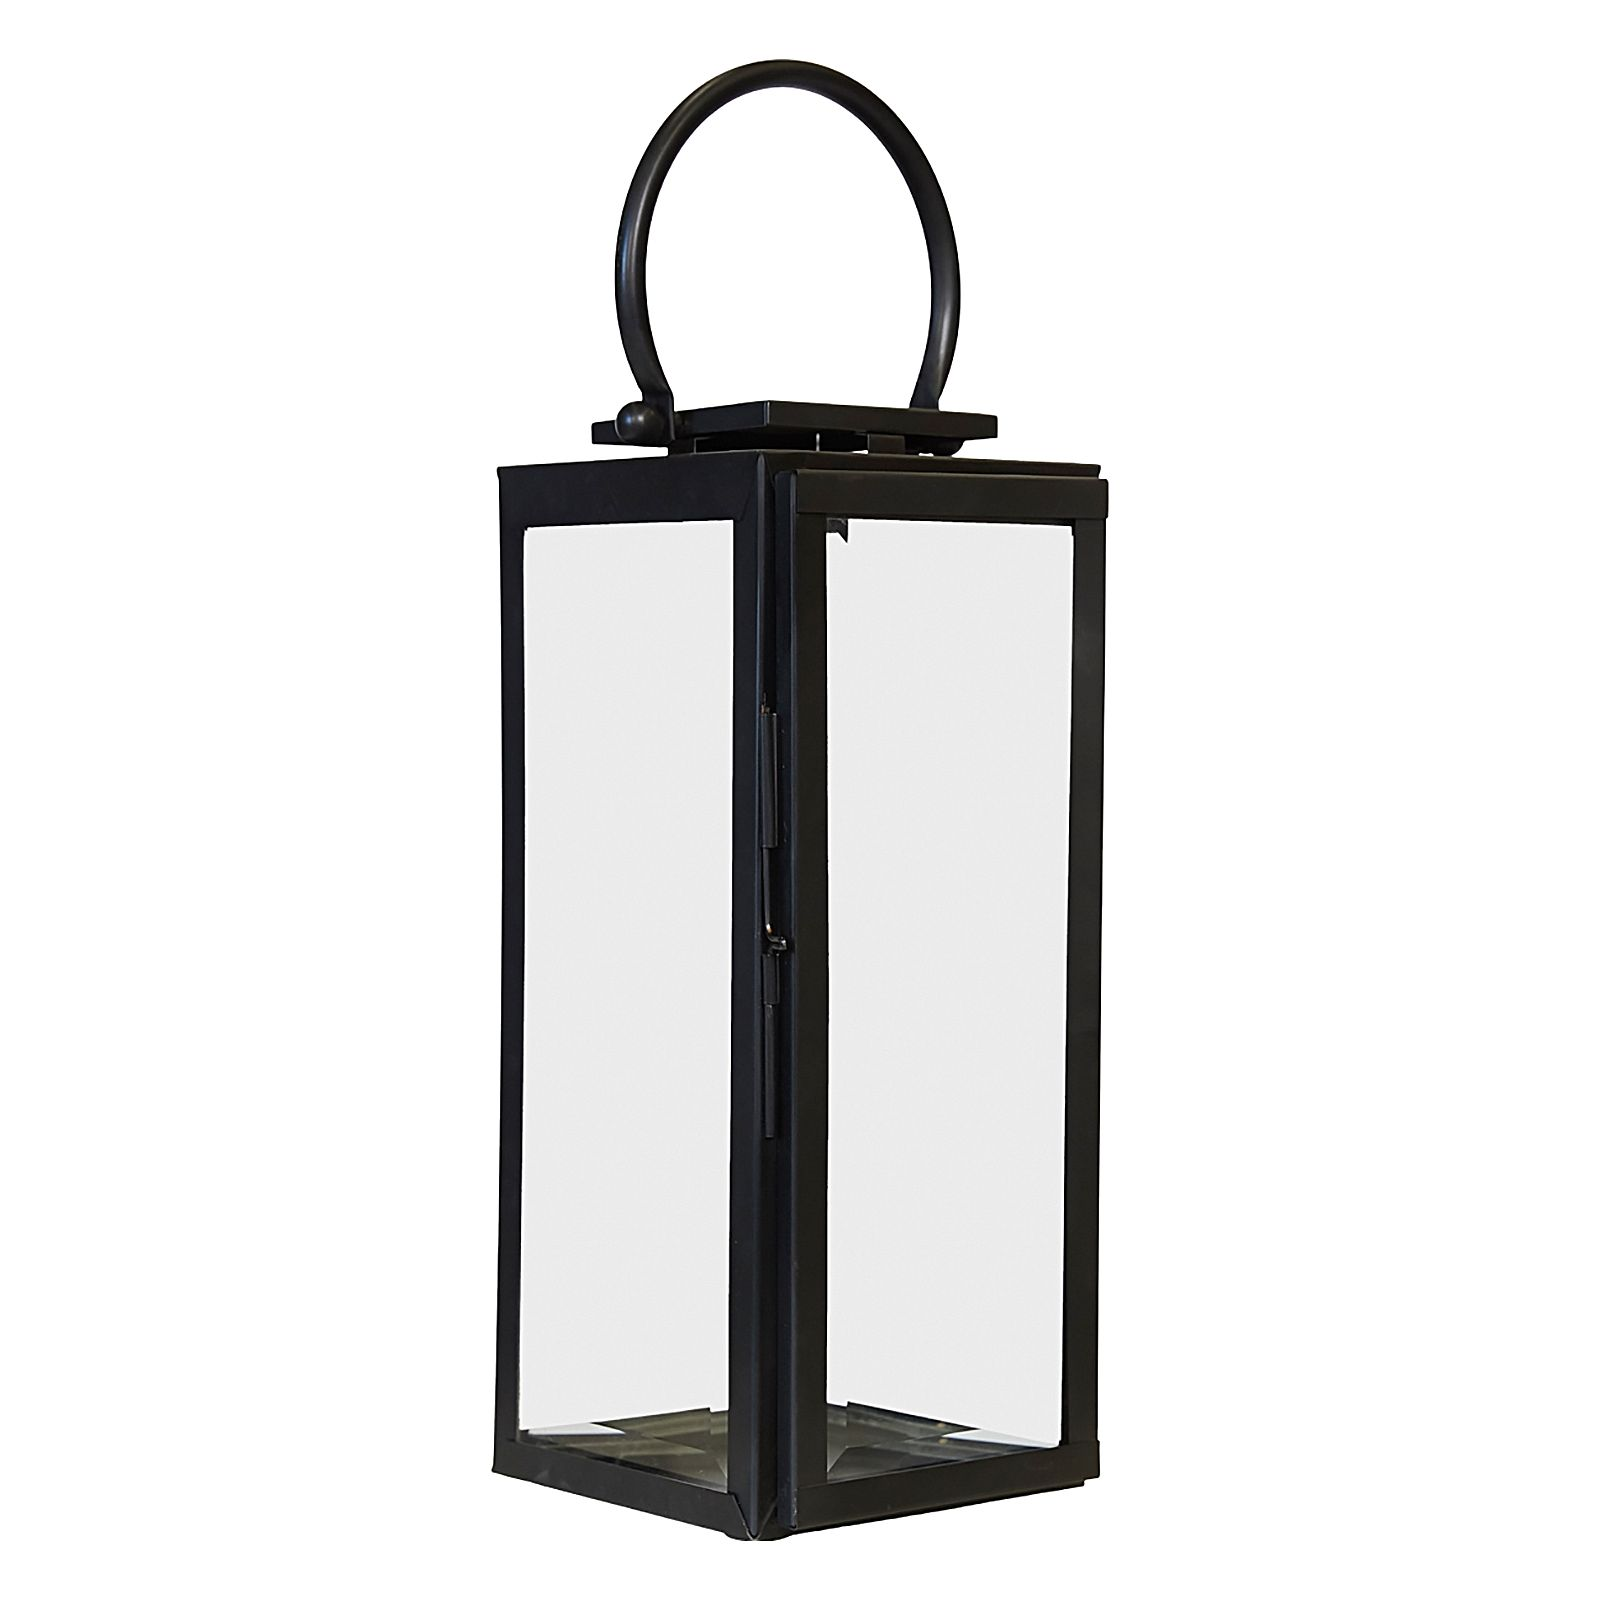 cafe-lighting-226171-550736